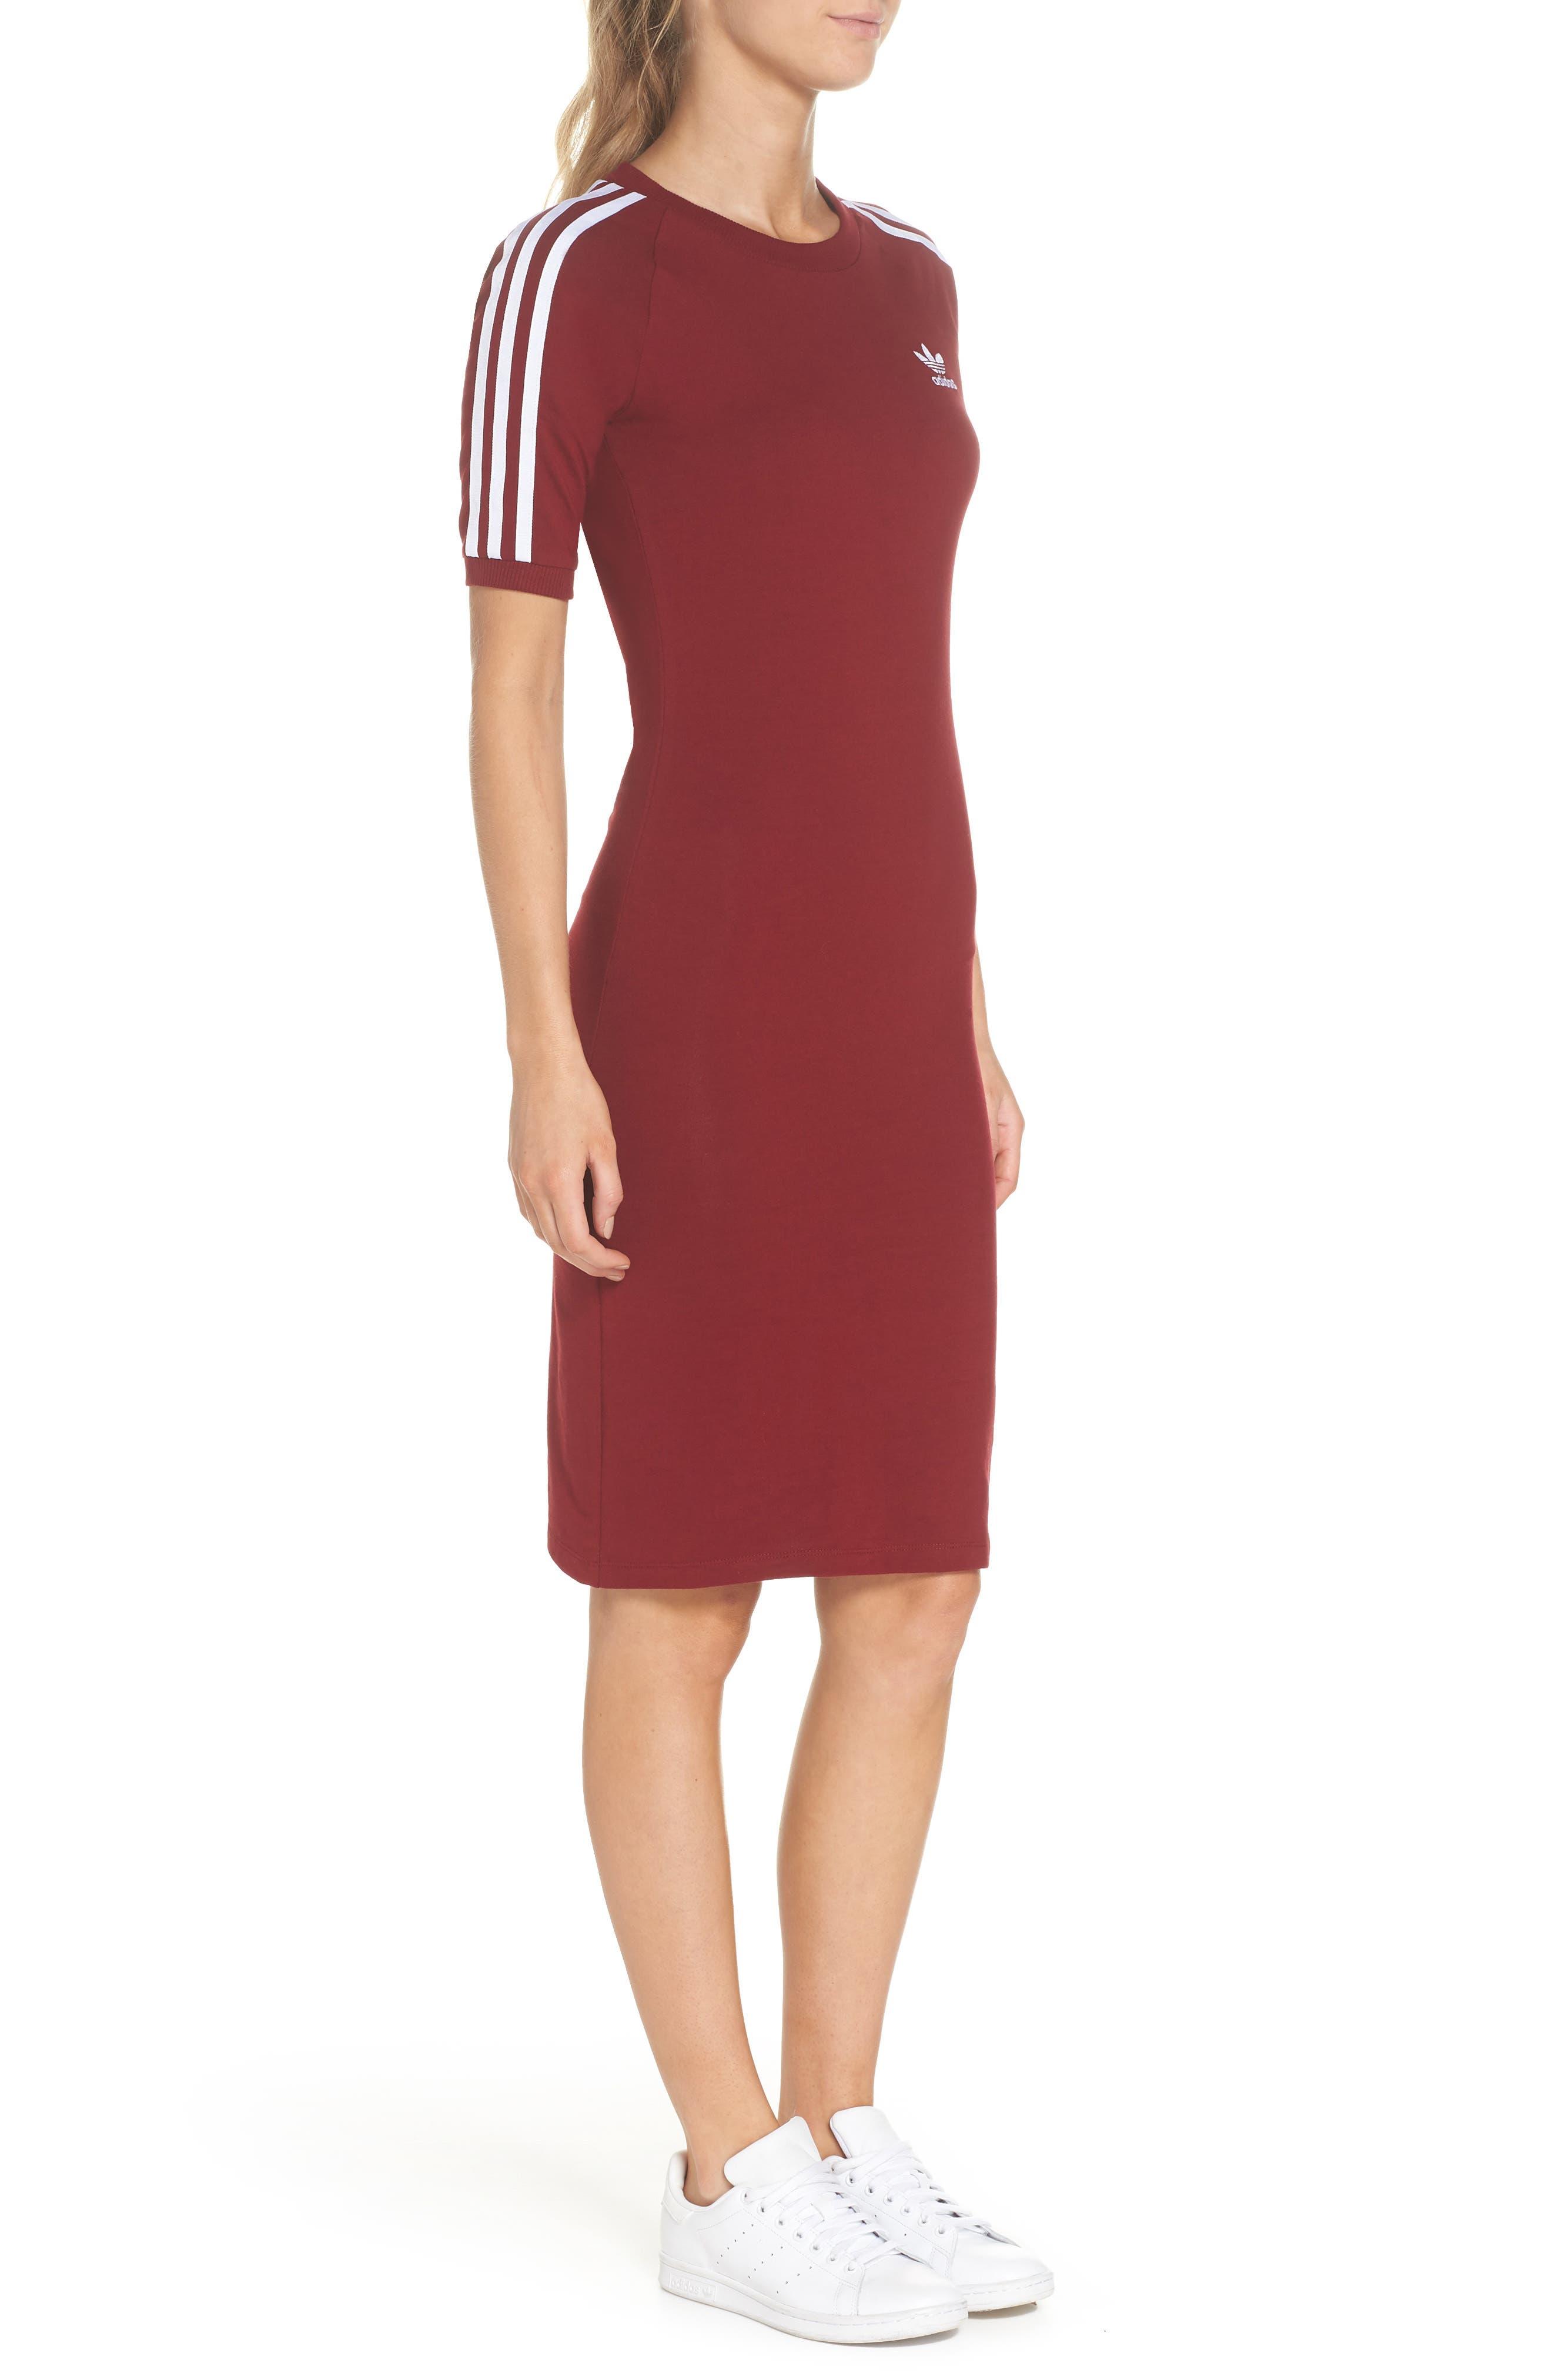 Originals 3-Stripes Dress,                             Alternate thumbnail 3, color,                             Collegiate Burgundy